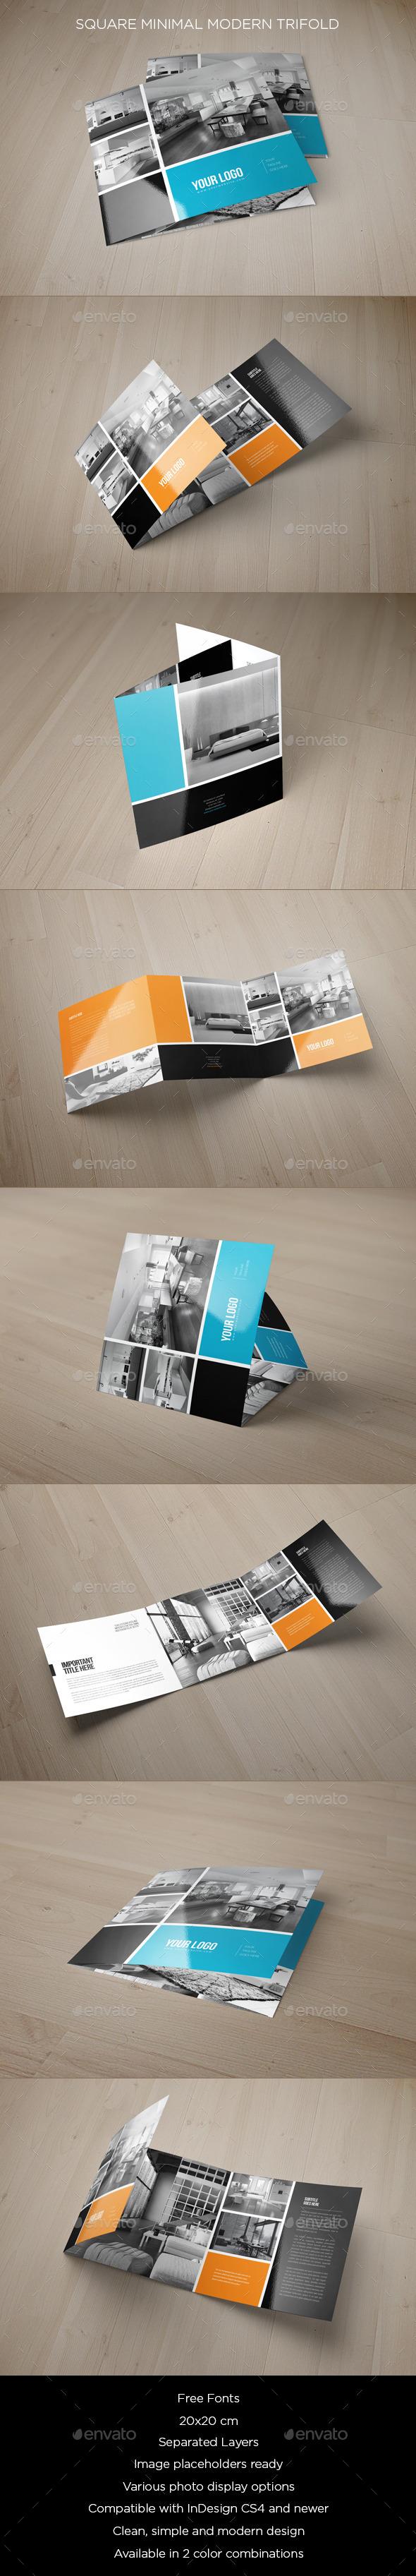 GraphicRiver Square Minimal Modern Trifold 9248521